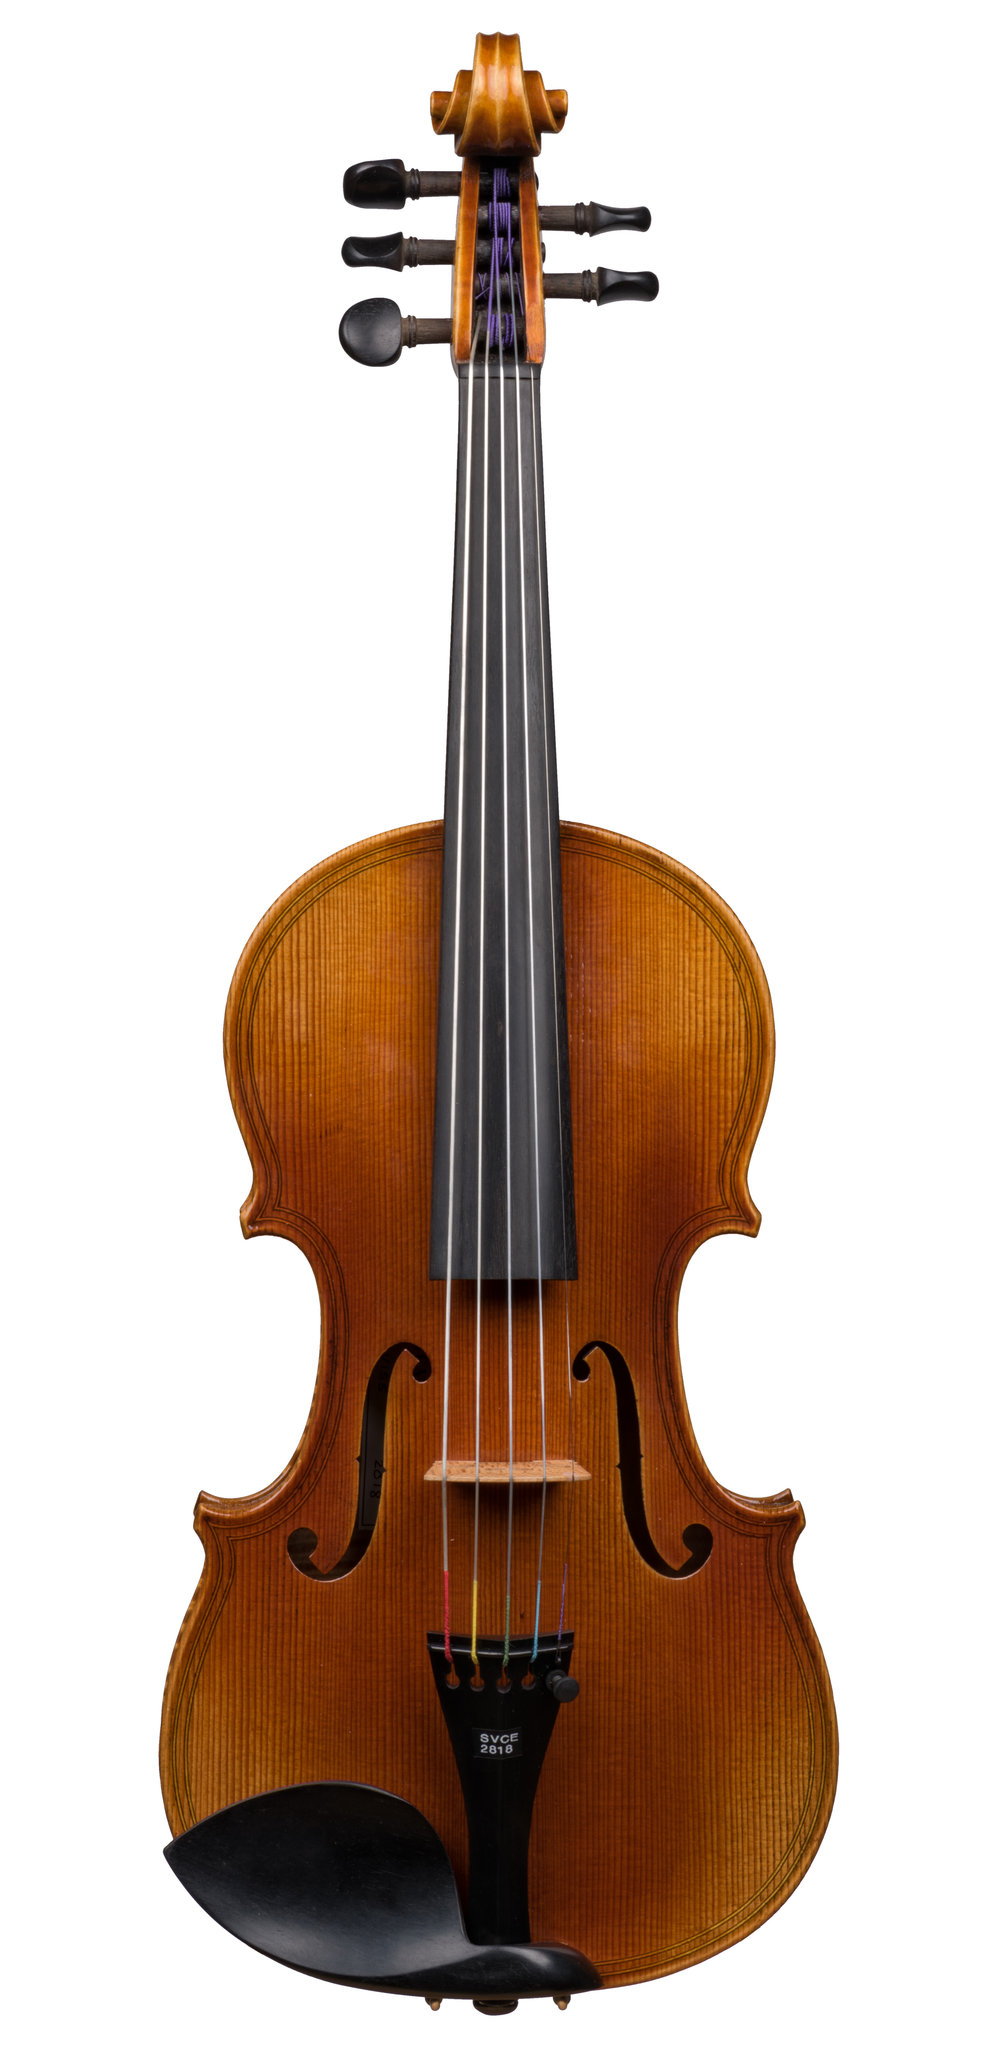 Seman Violins SV155,5-String -